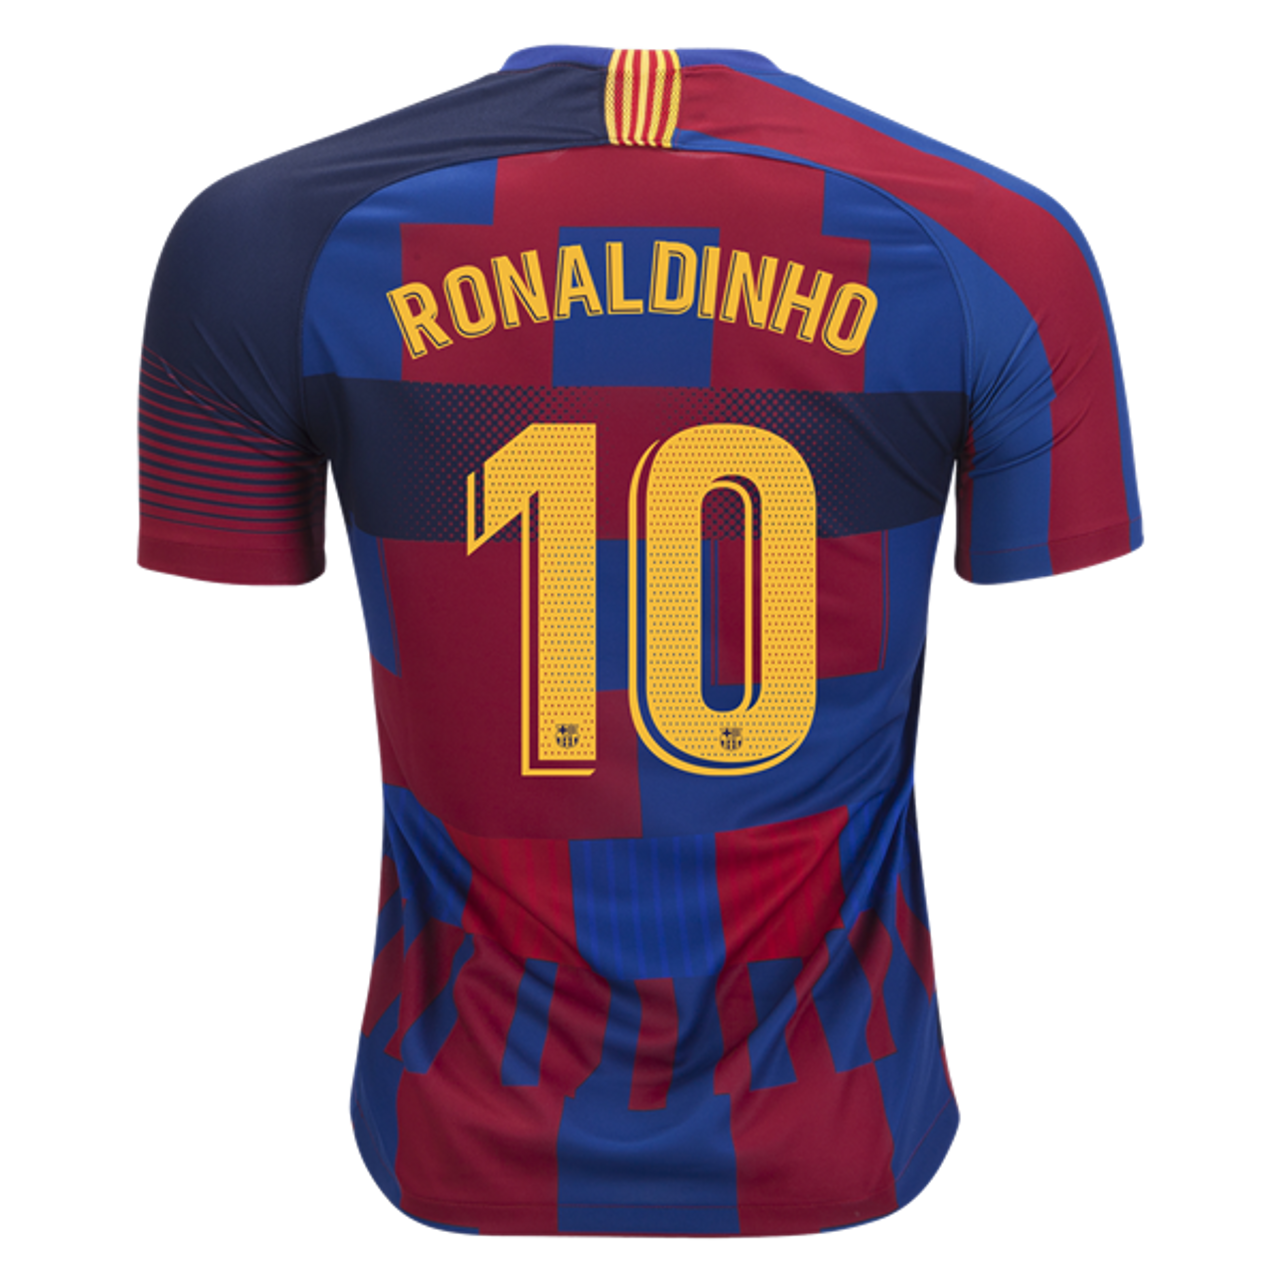 NIKE BARCELONA 2019 AUTHENTIC 20TH ANNIVERSARY `RONALDINHO` JERSEY - Soccer  Plus